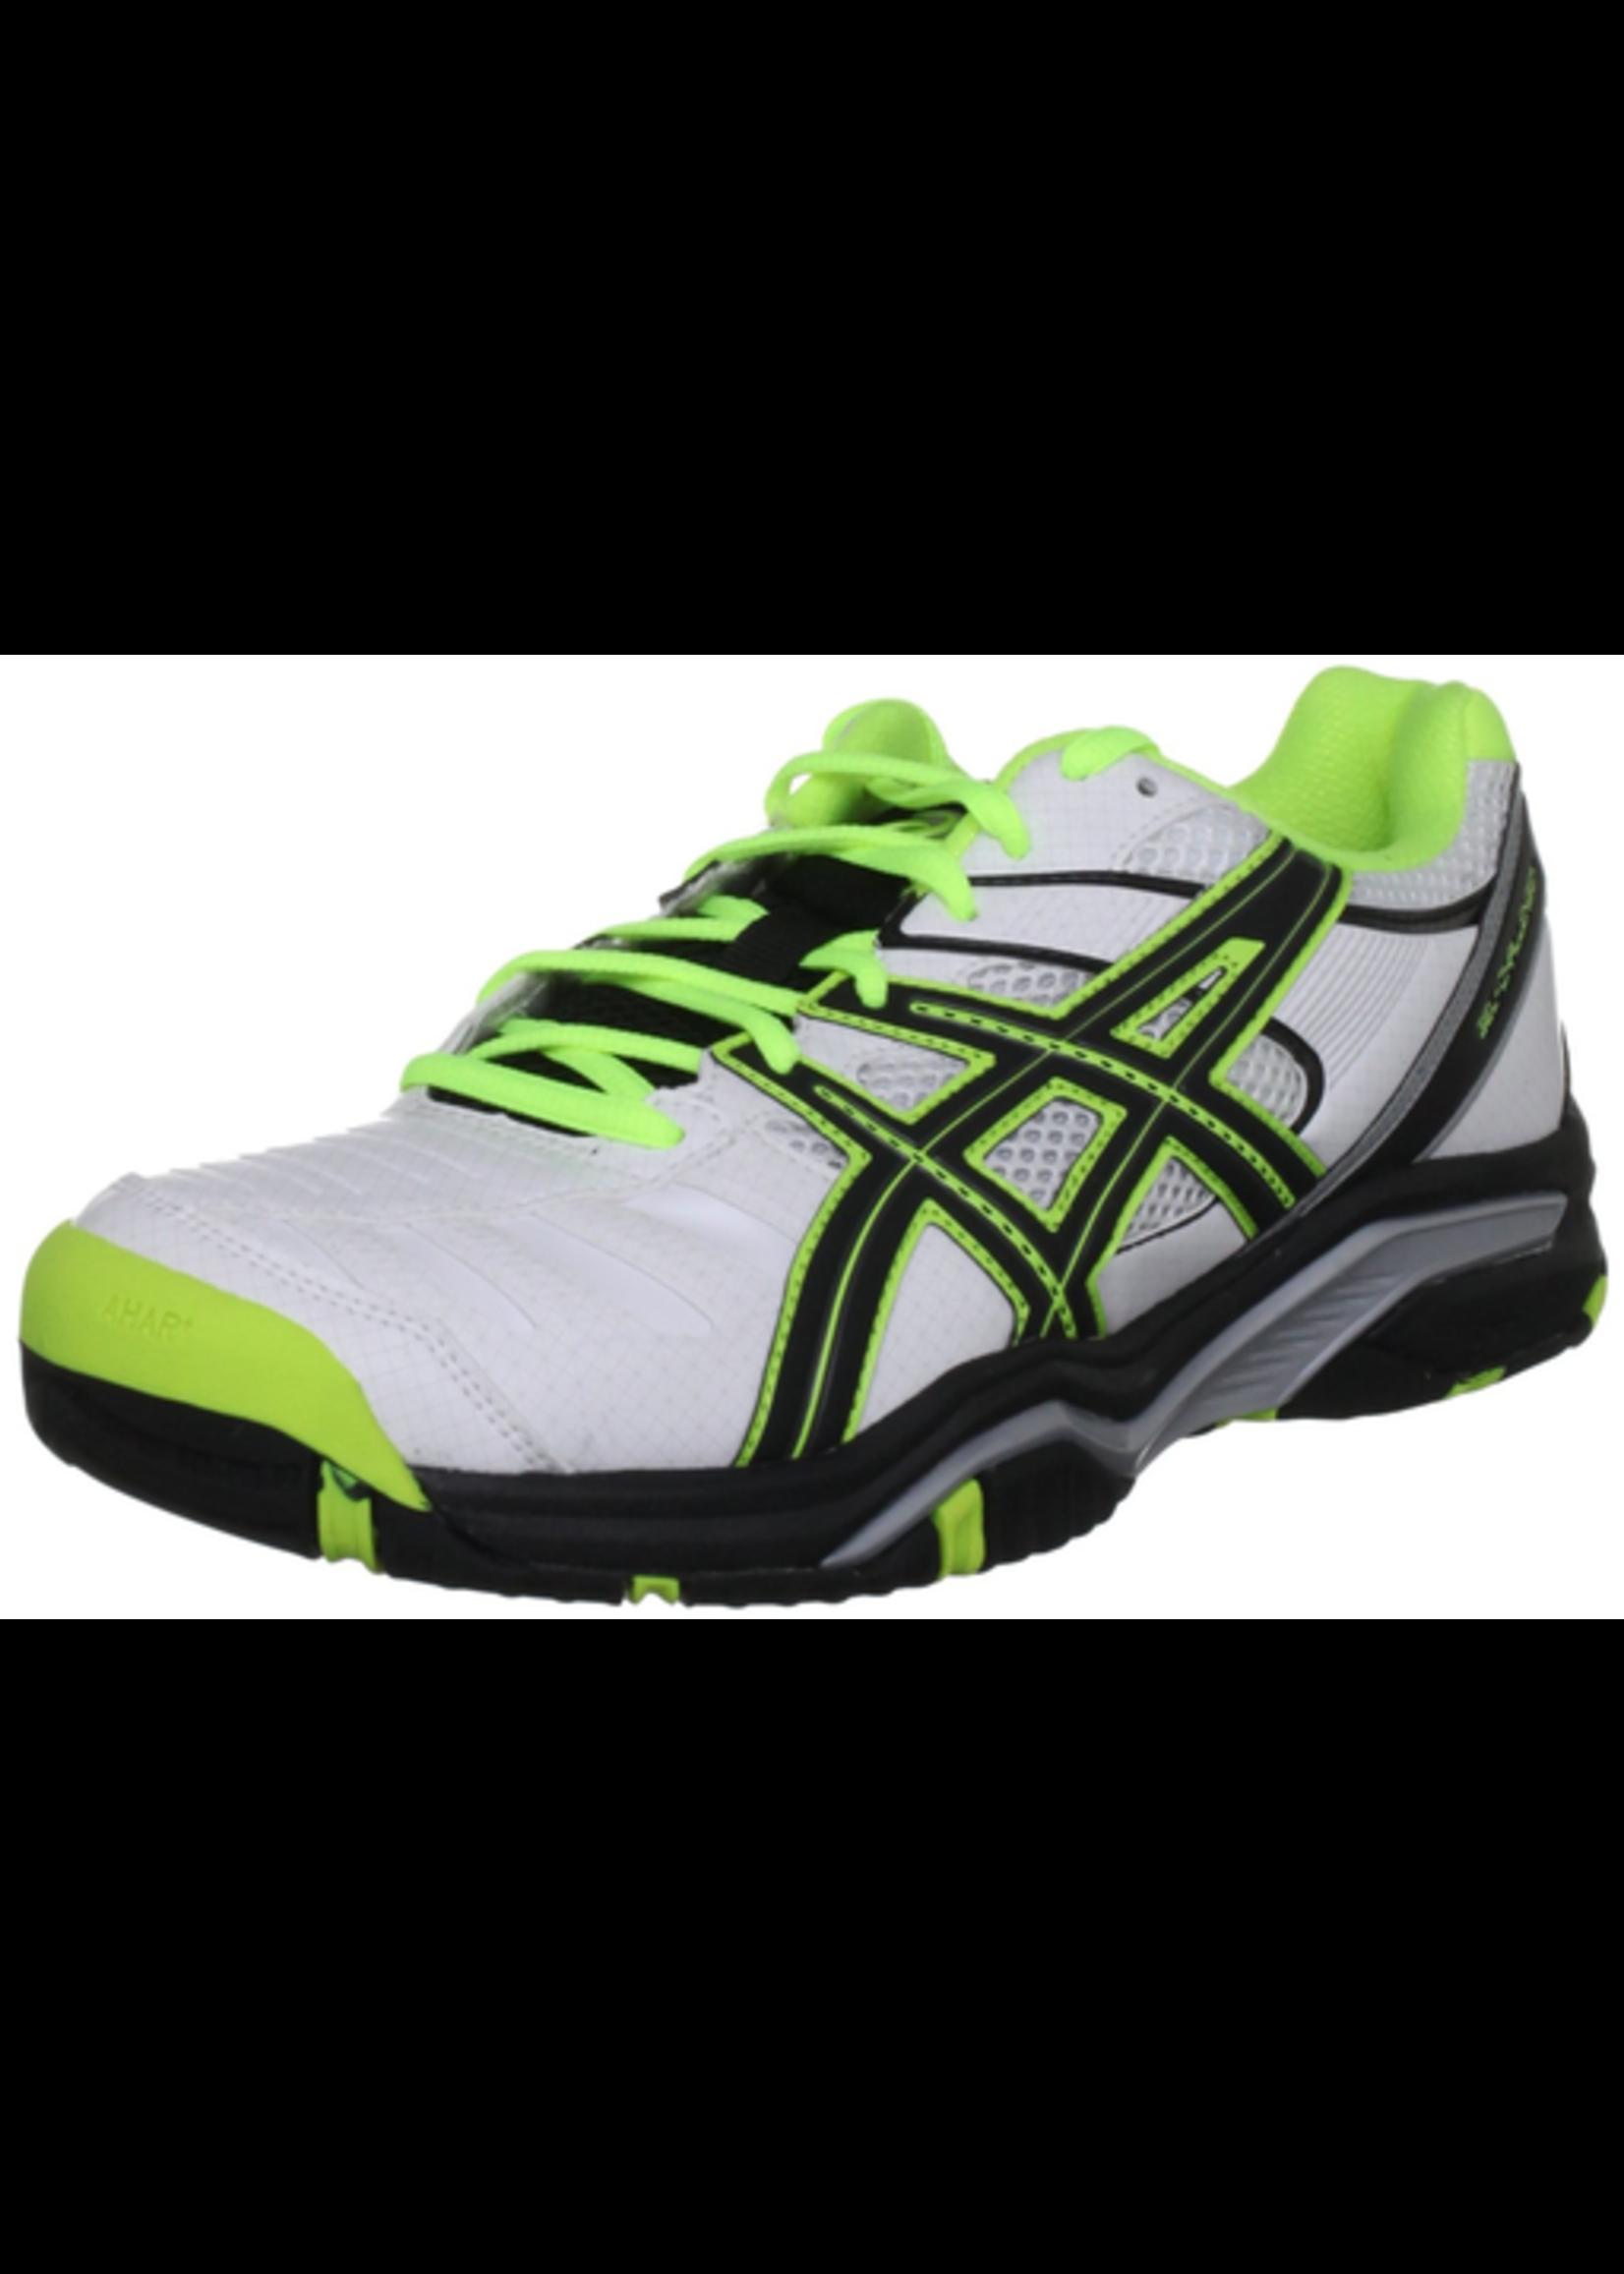 Asics Asics Gel-Challenger 9 Mens Tennis Shoe White/Black/Flash Yellow 7